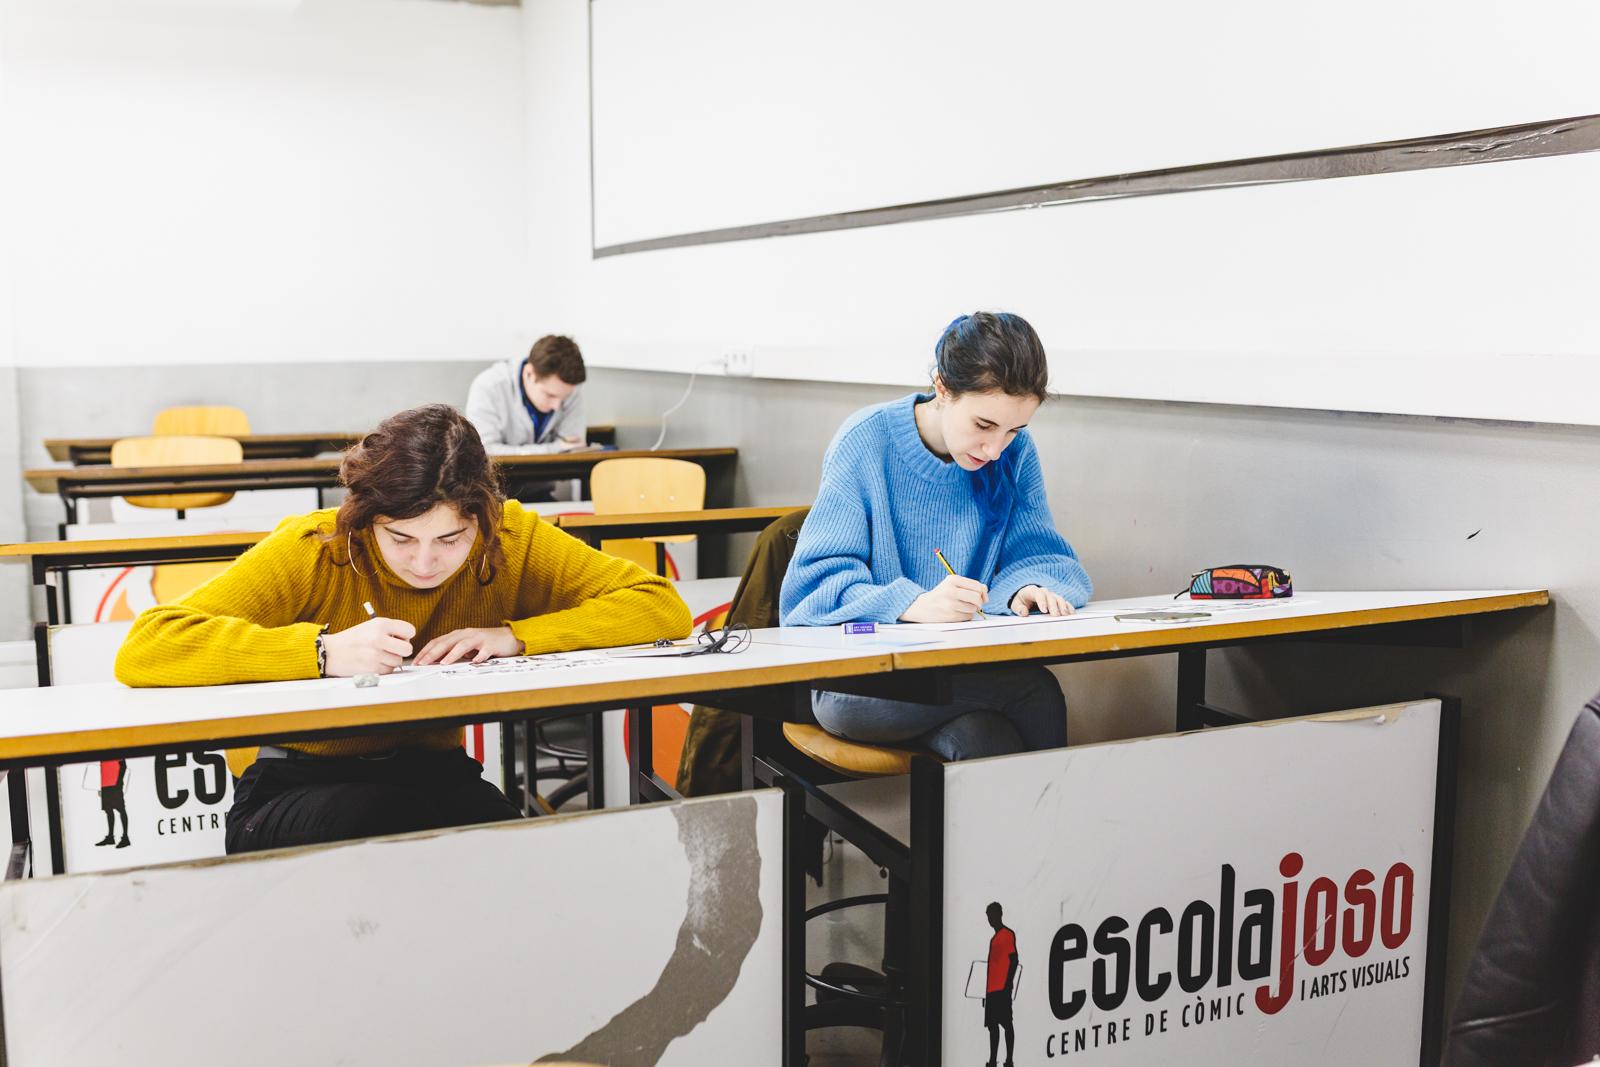 escuela-de-comic-joso-barcelona-fotografia-corporativa-misshappyflash-31.jpg